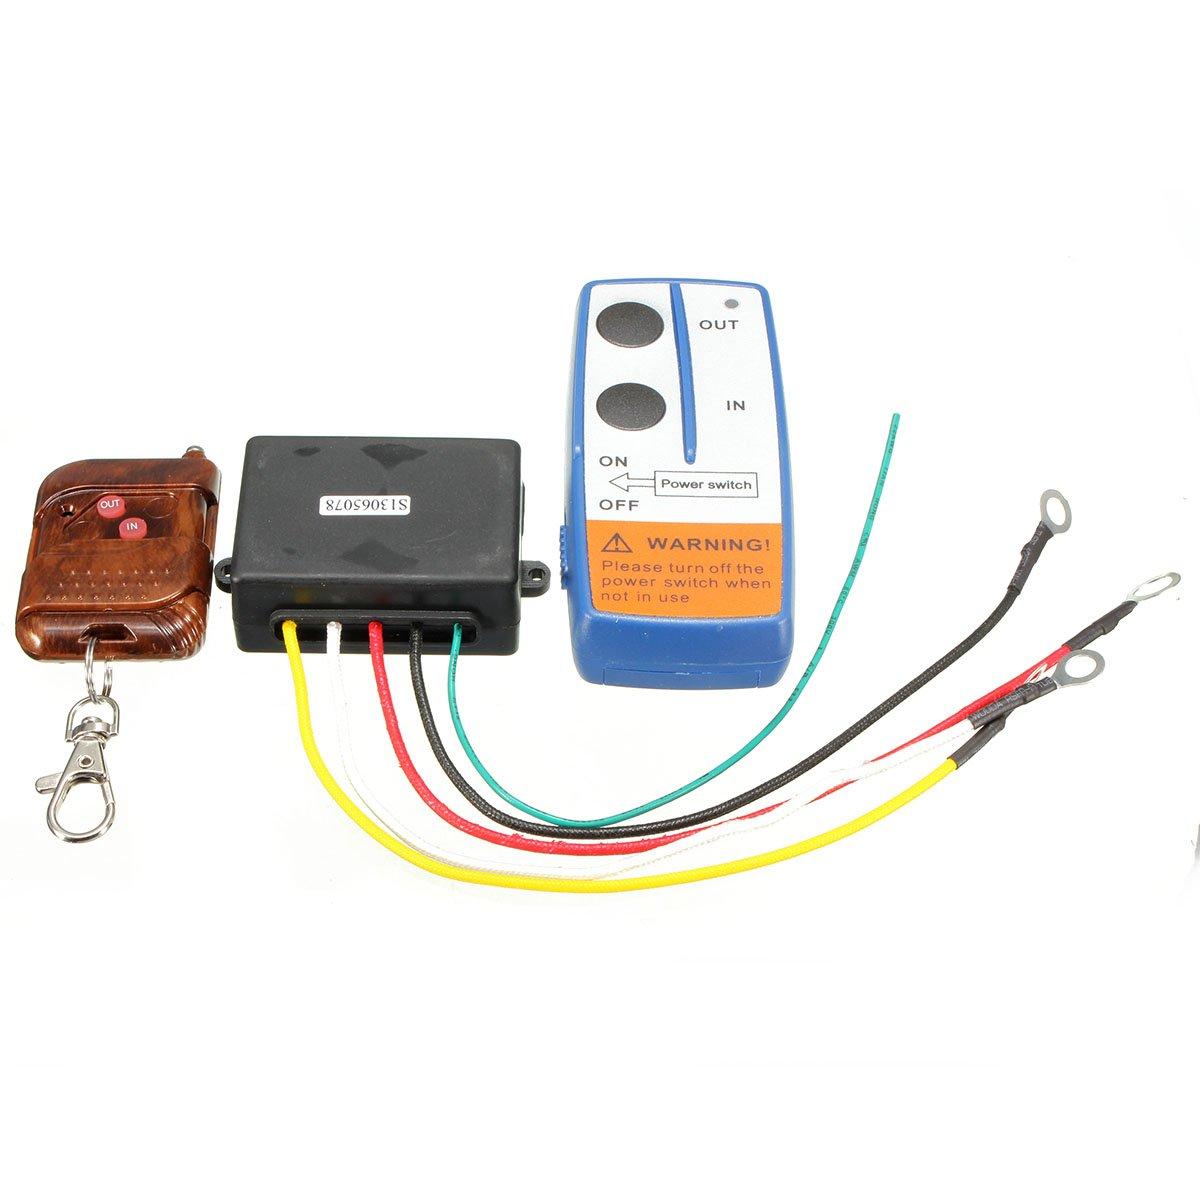 ILS –  12 V 75 ft Winch Wireless Remote Key Fob Keychain controlador Kits for TUFF Stuff I LOVE SHOPPING